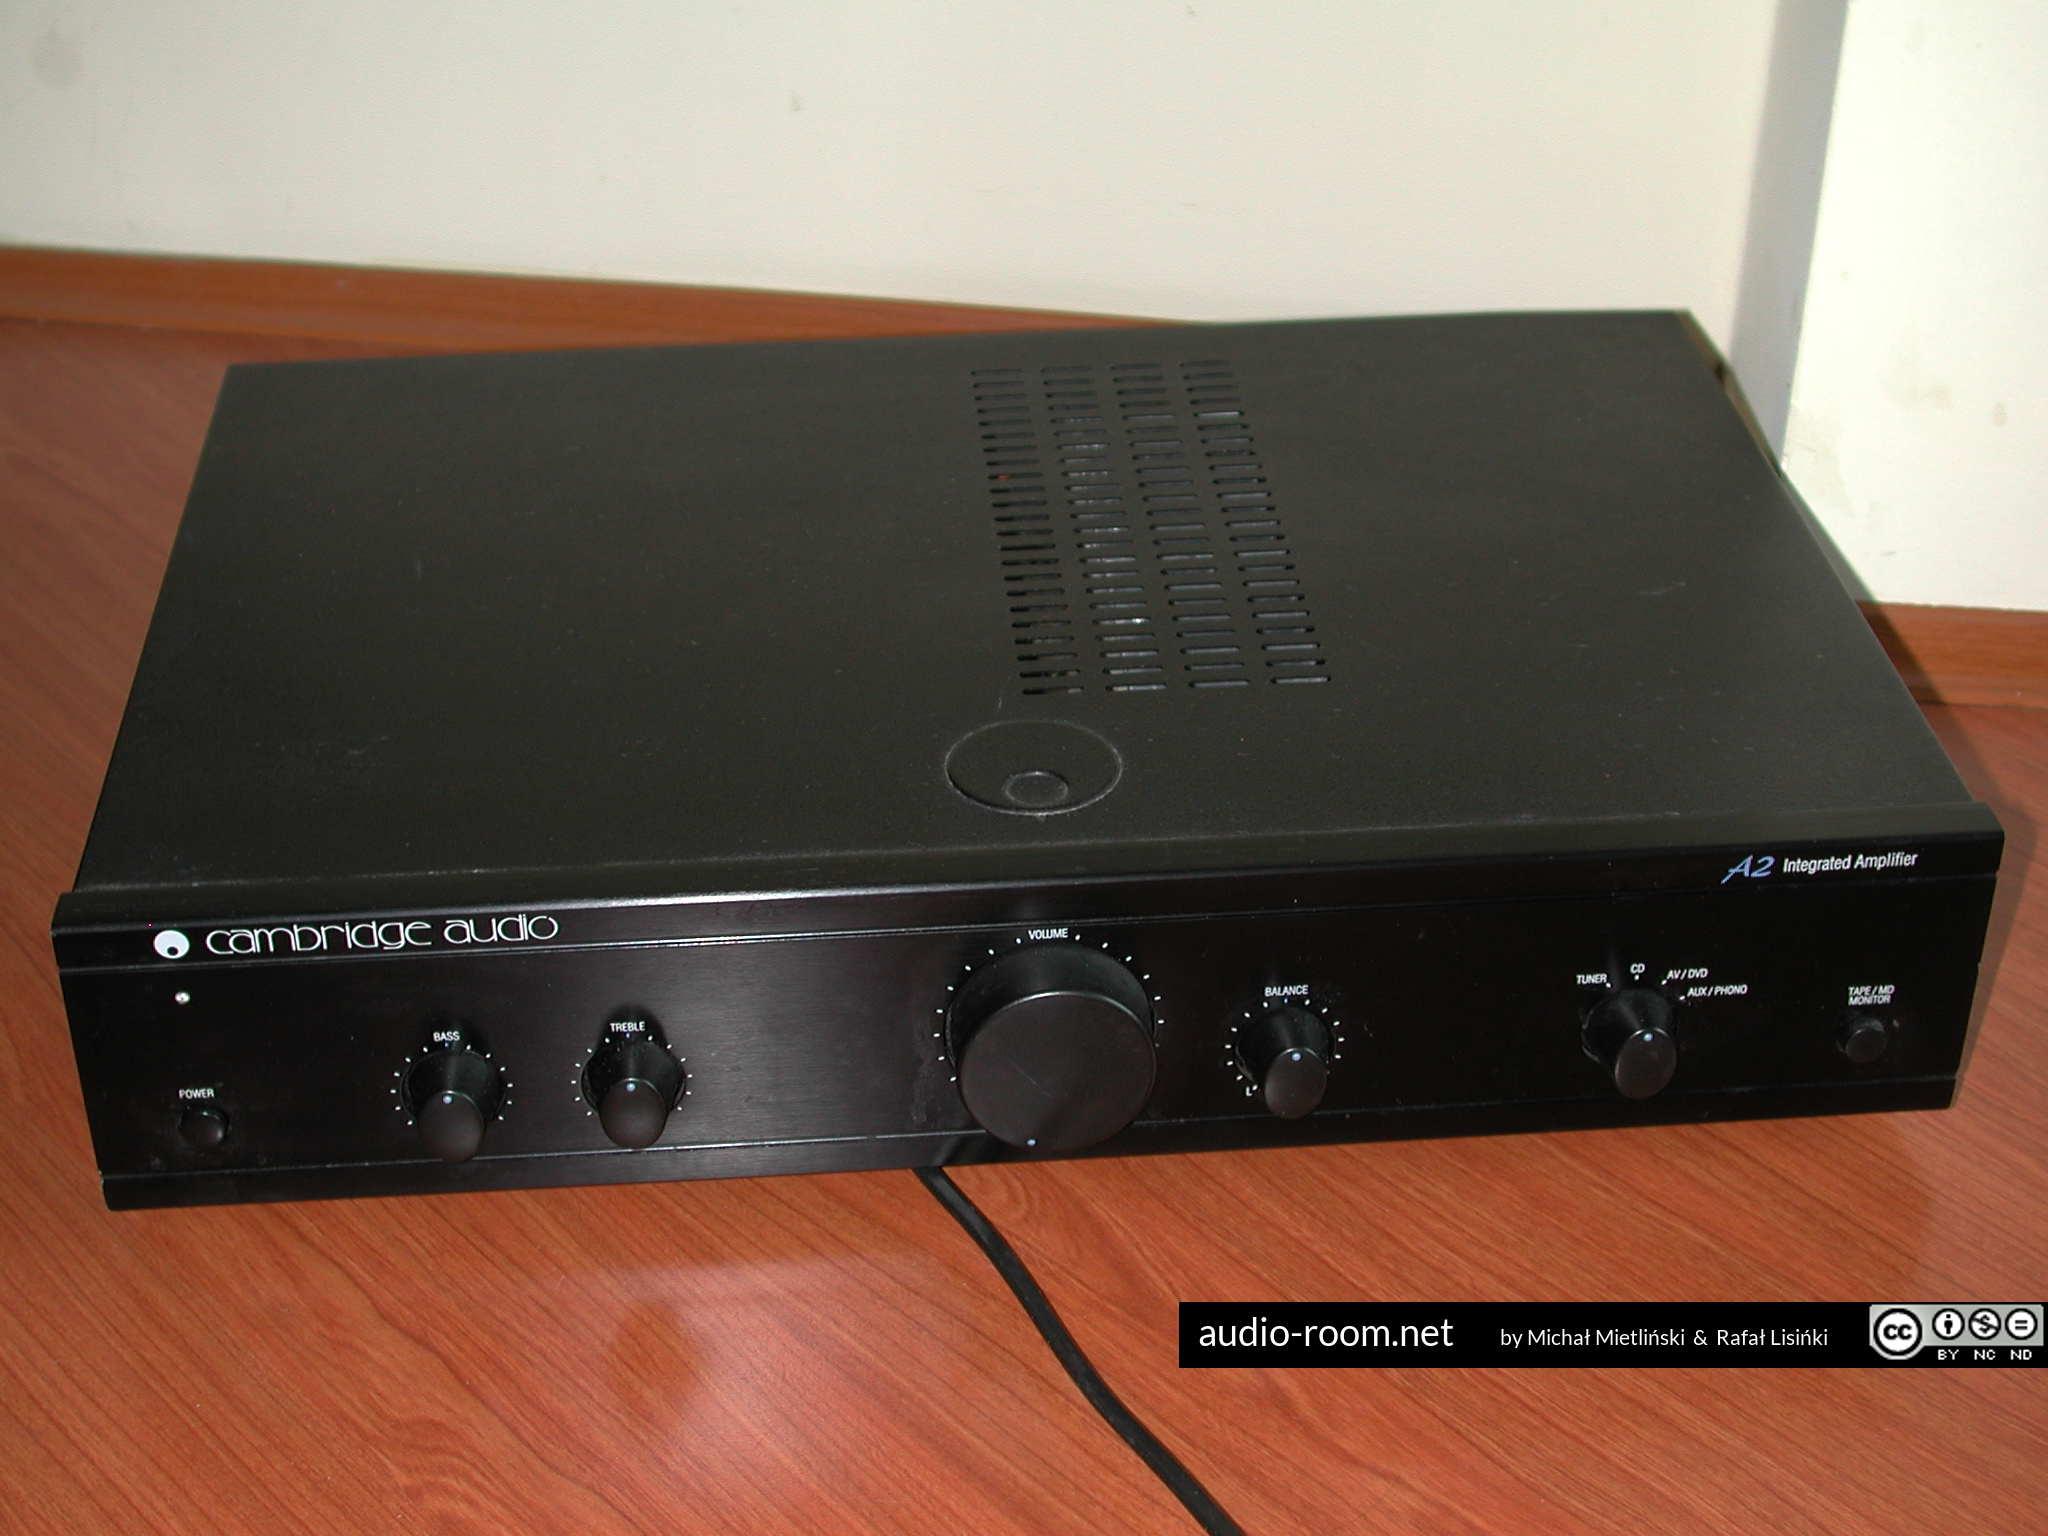 cambridge-audio-a2-dscn0888